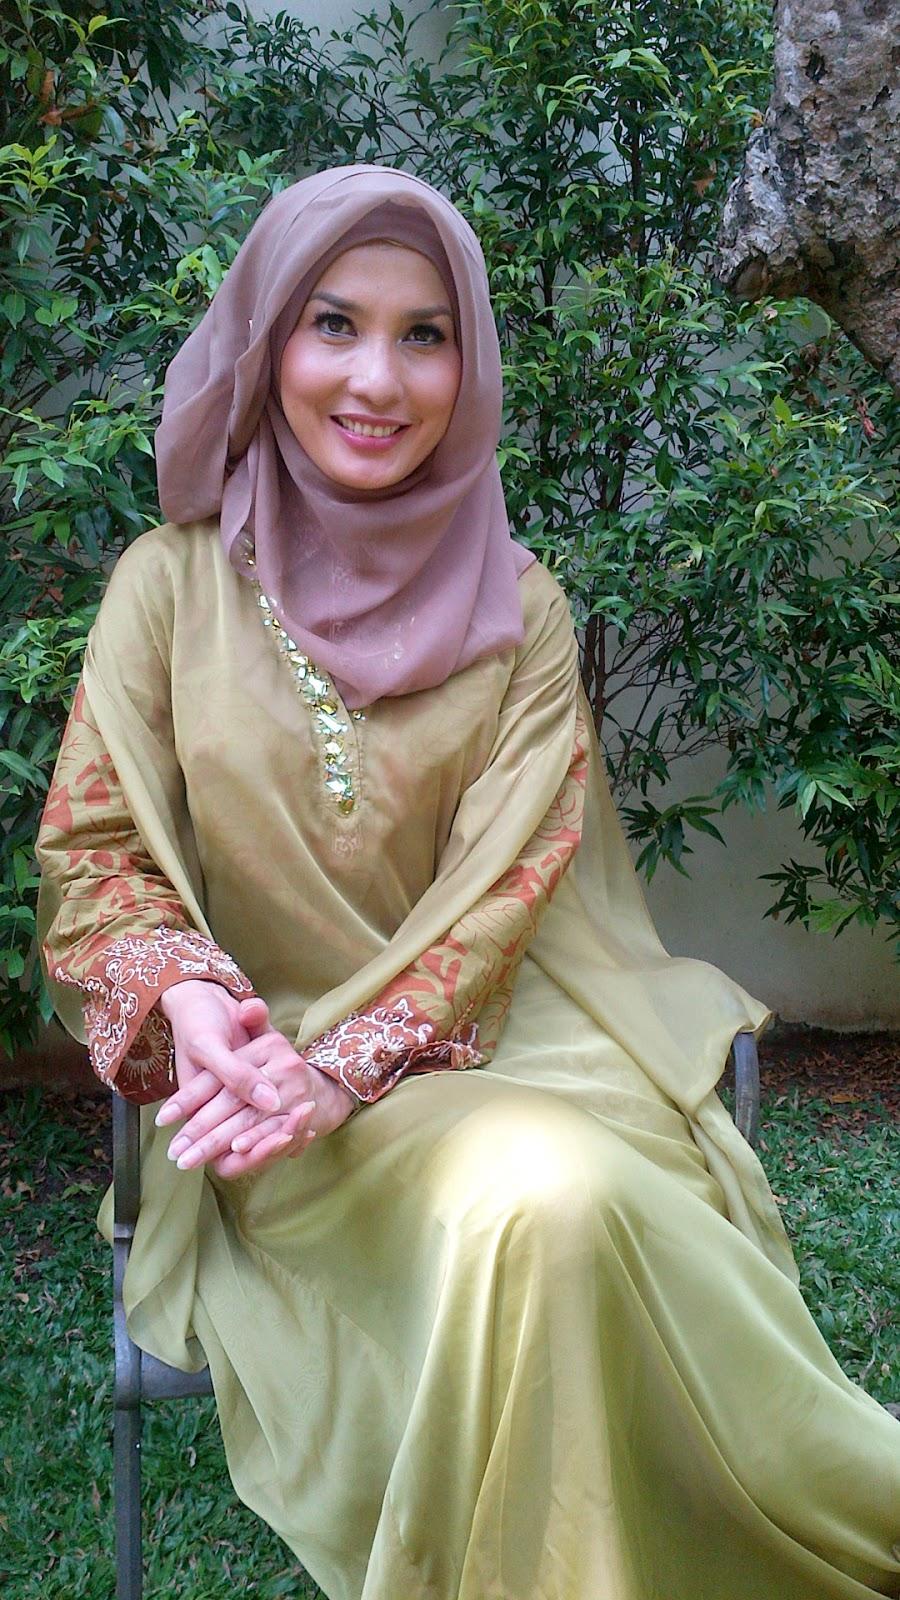 wallpaper HD muslimah cantik hijab jilbab susun indah dan seksi manis